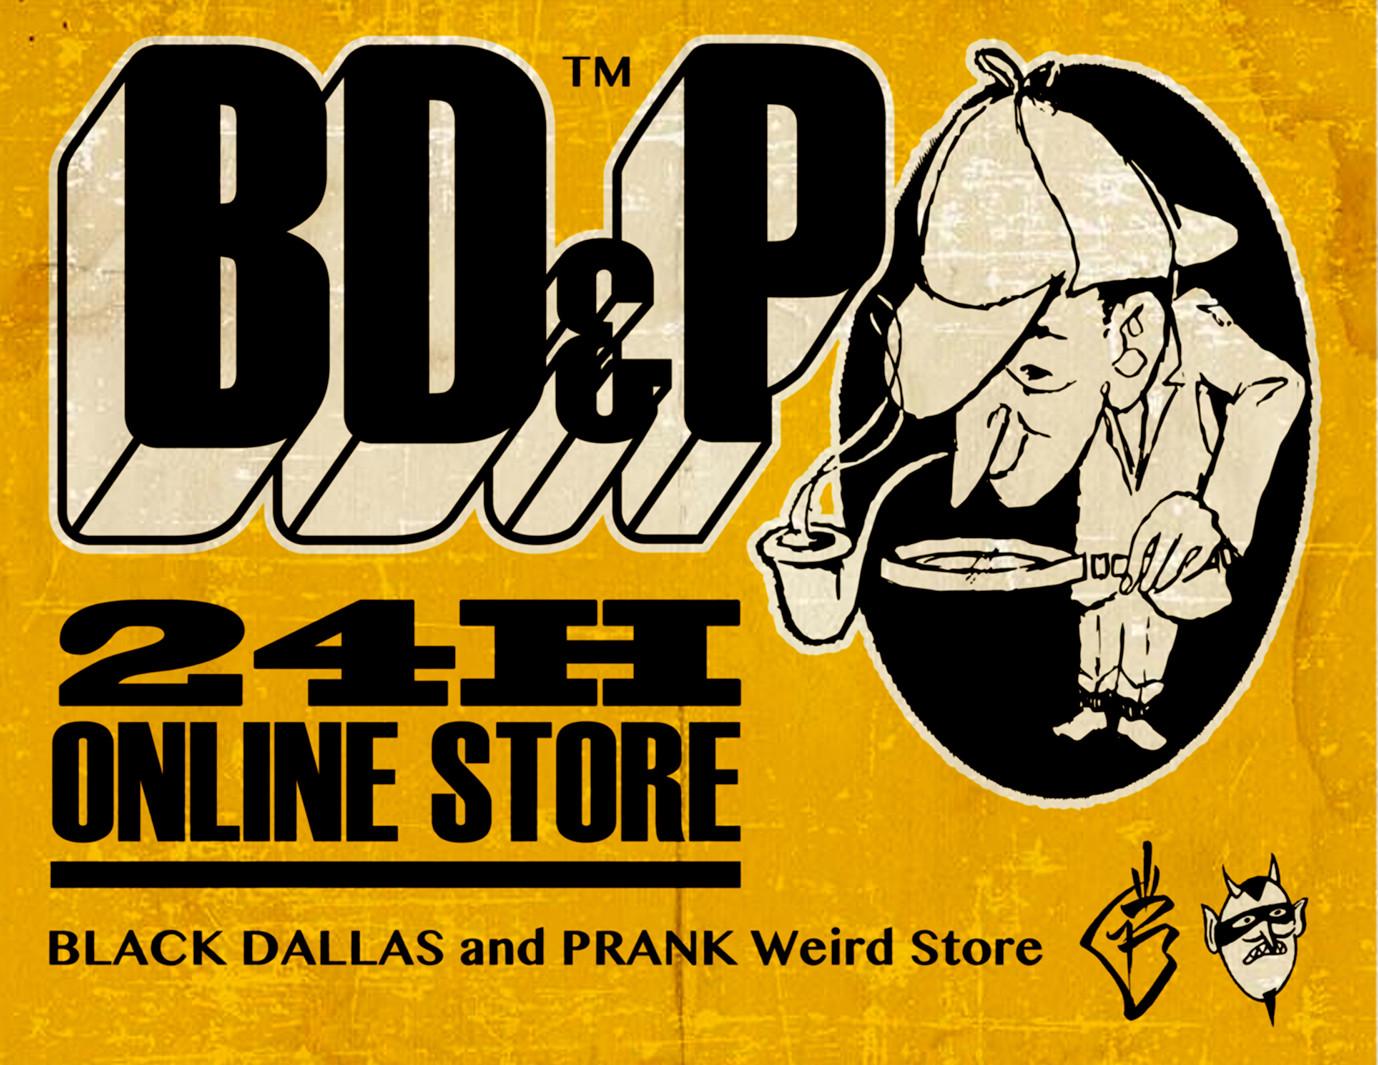 BD&P 24H ONLINE STORE - BLACK DALLAS & PRANK Weird Store